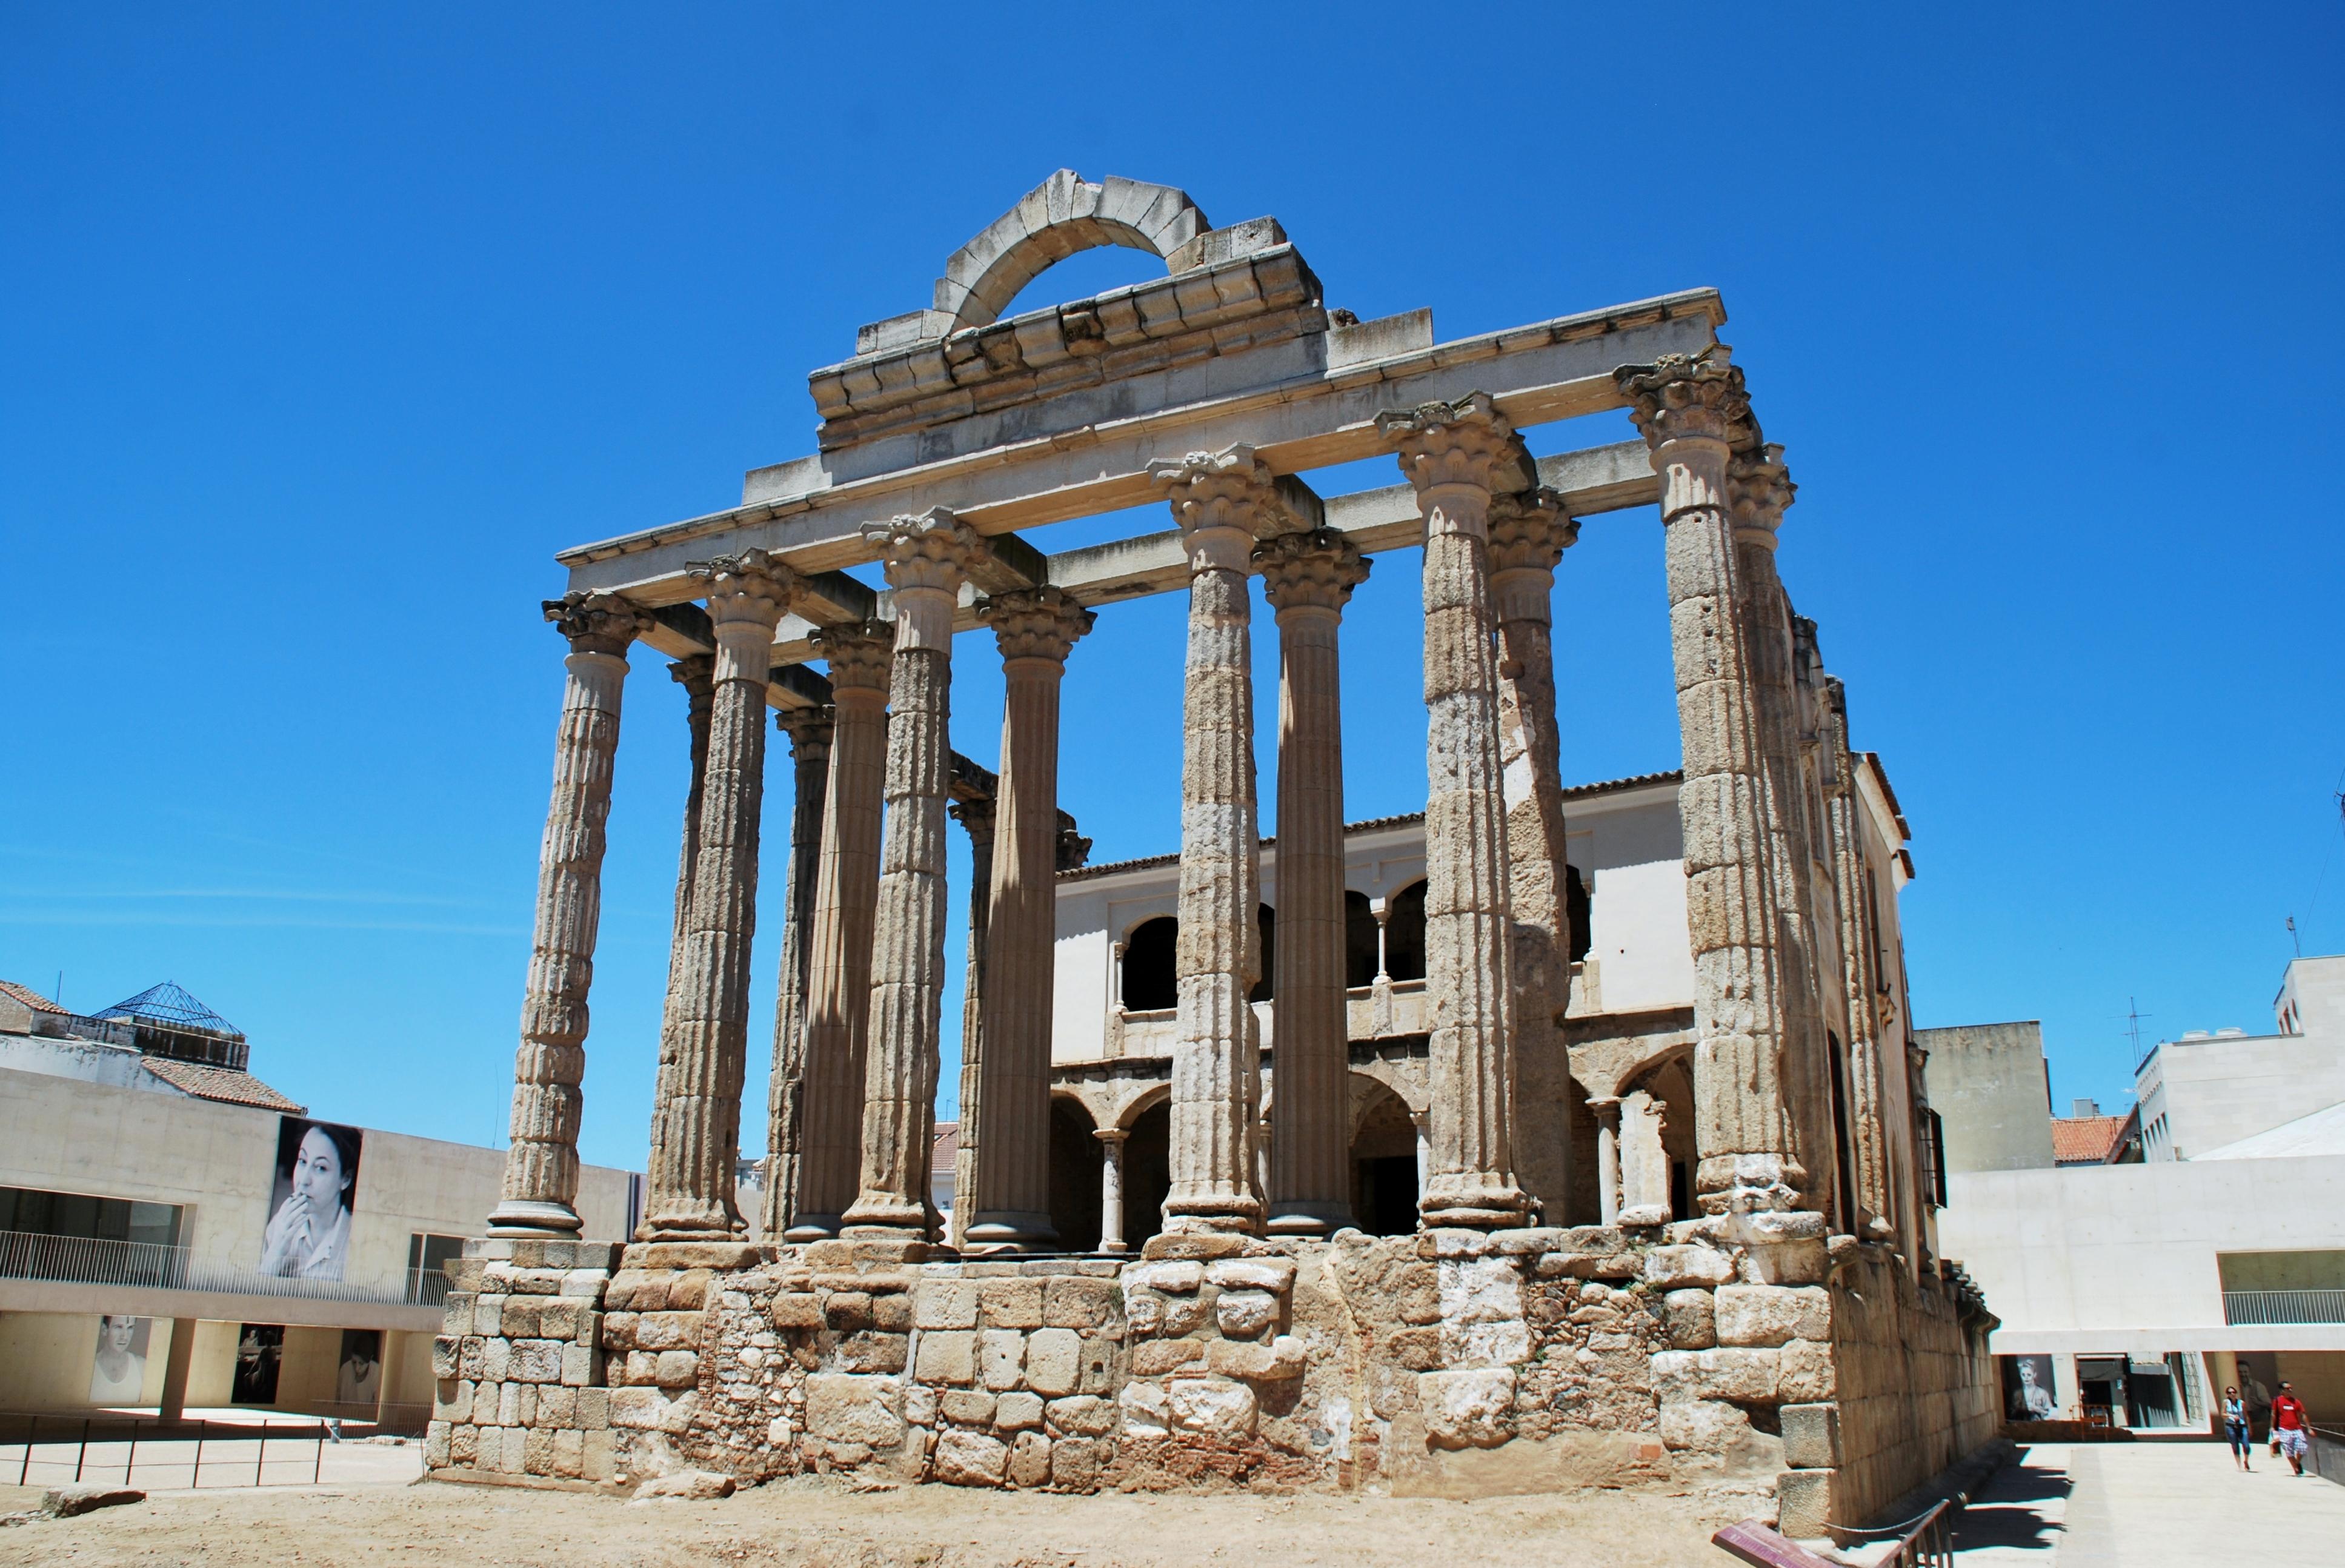 Restauró el Templo de Diana. Foto Javier 1949 Flick